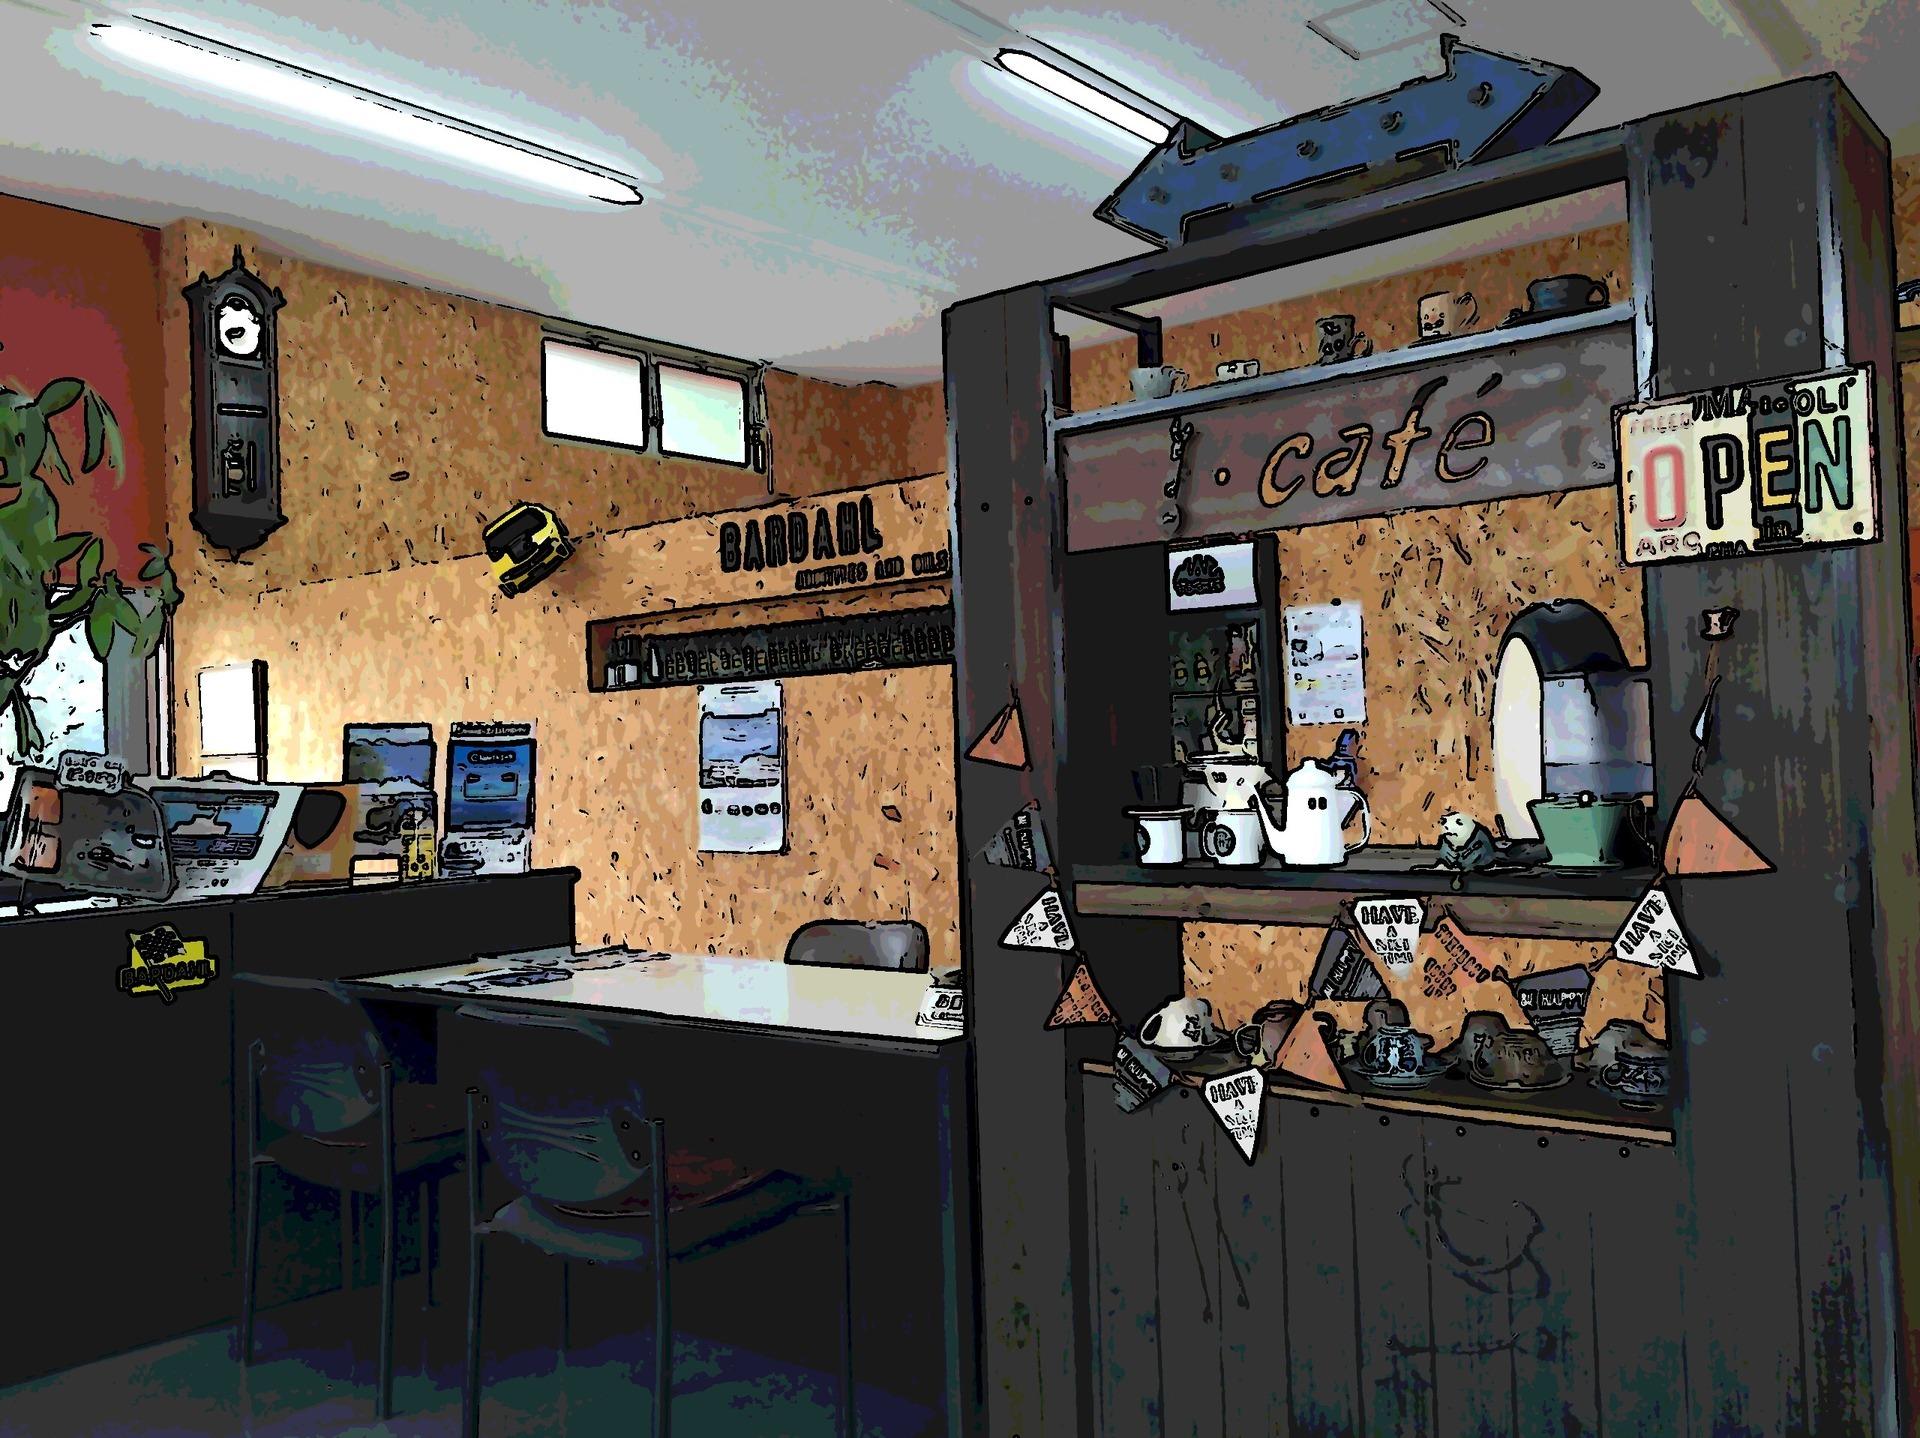 【i・café】リニューアルしました(*^^*) あたたかいお飲み物いかがでしょうか?